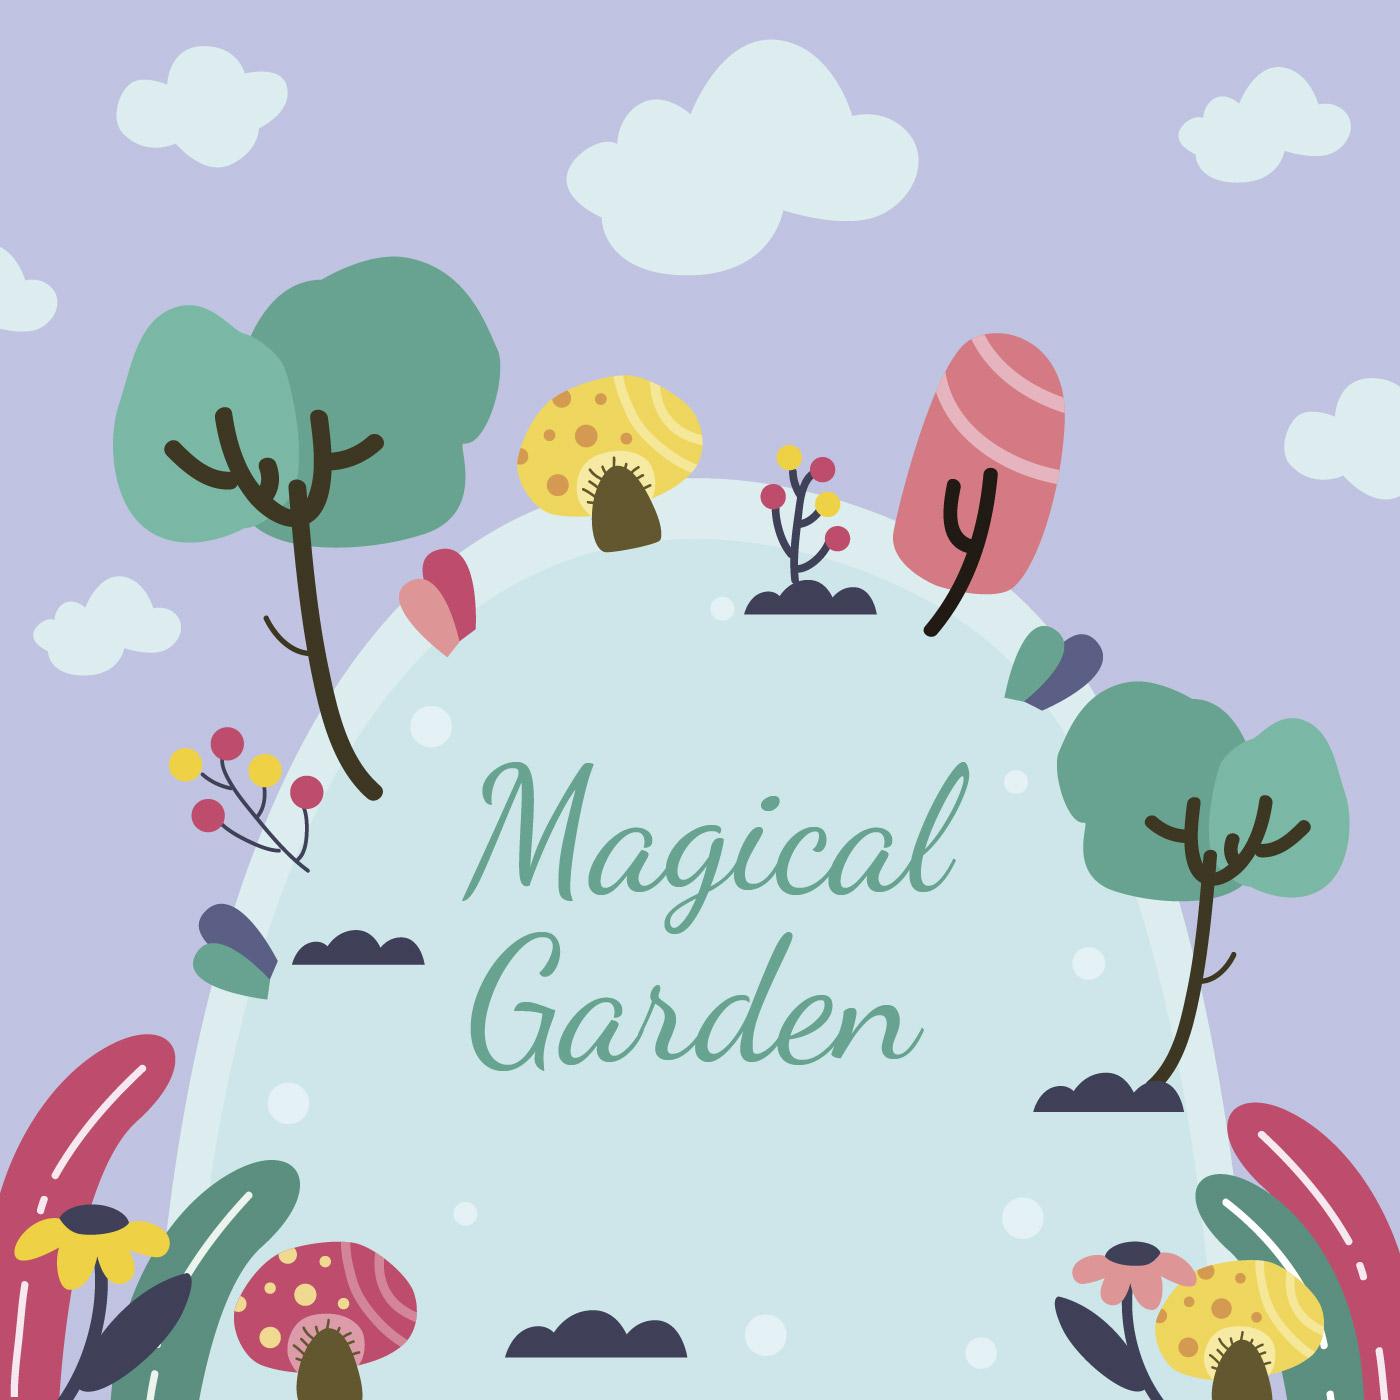 Childlike magical garden background download free vectors clipart graphics vector art - Enchanted garden collection free download ...